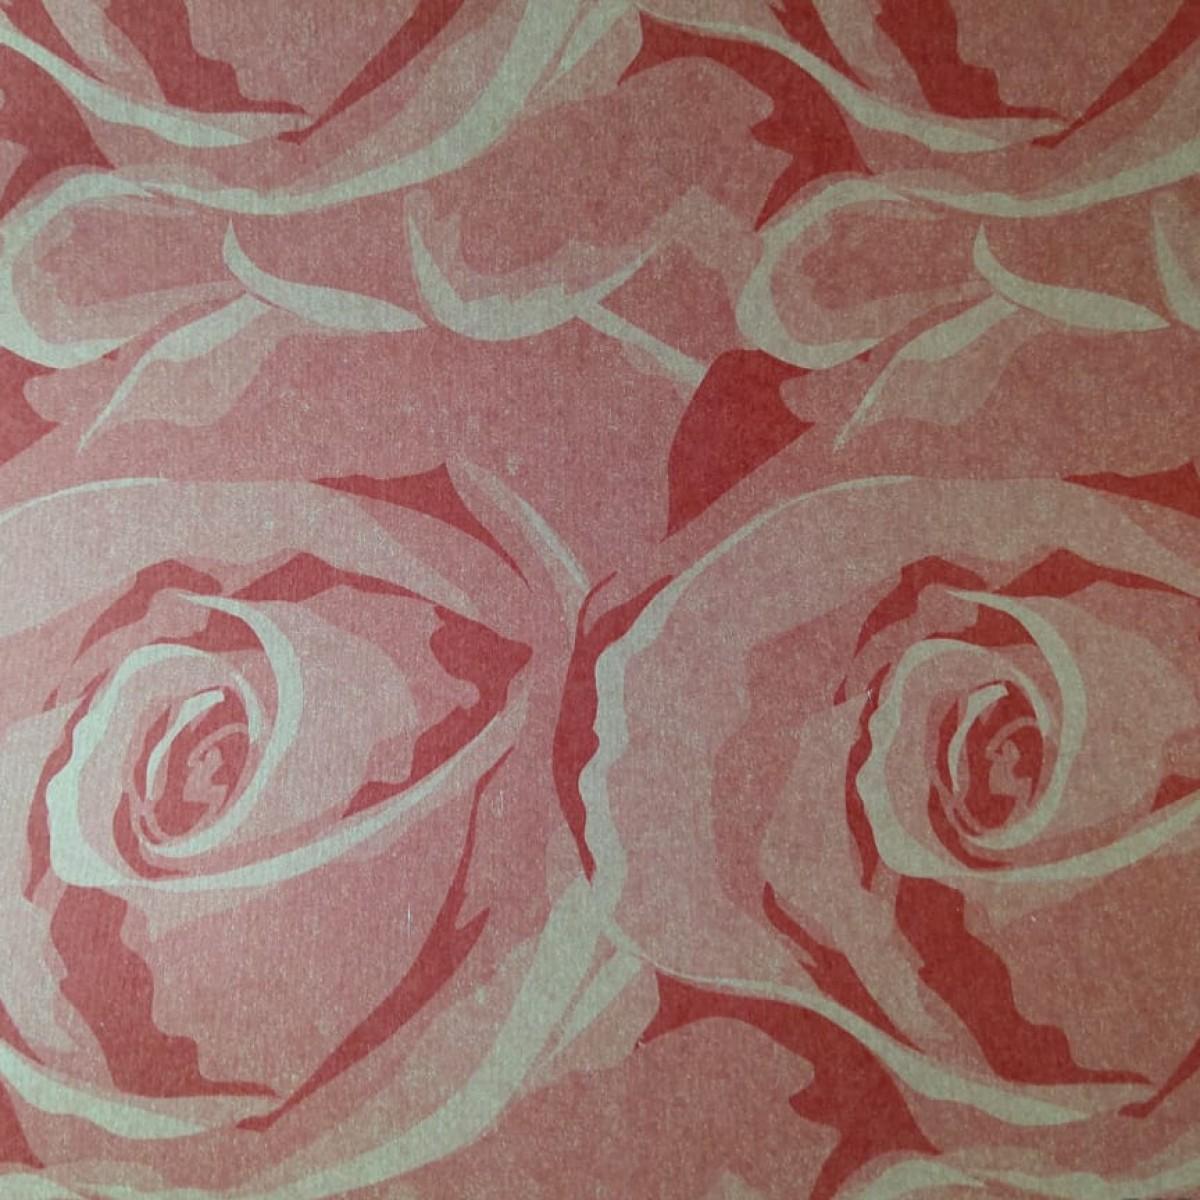 Red Floral Print 50cmx25m Kraft Paper - 1 Roll